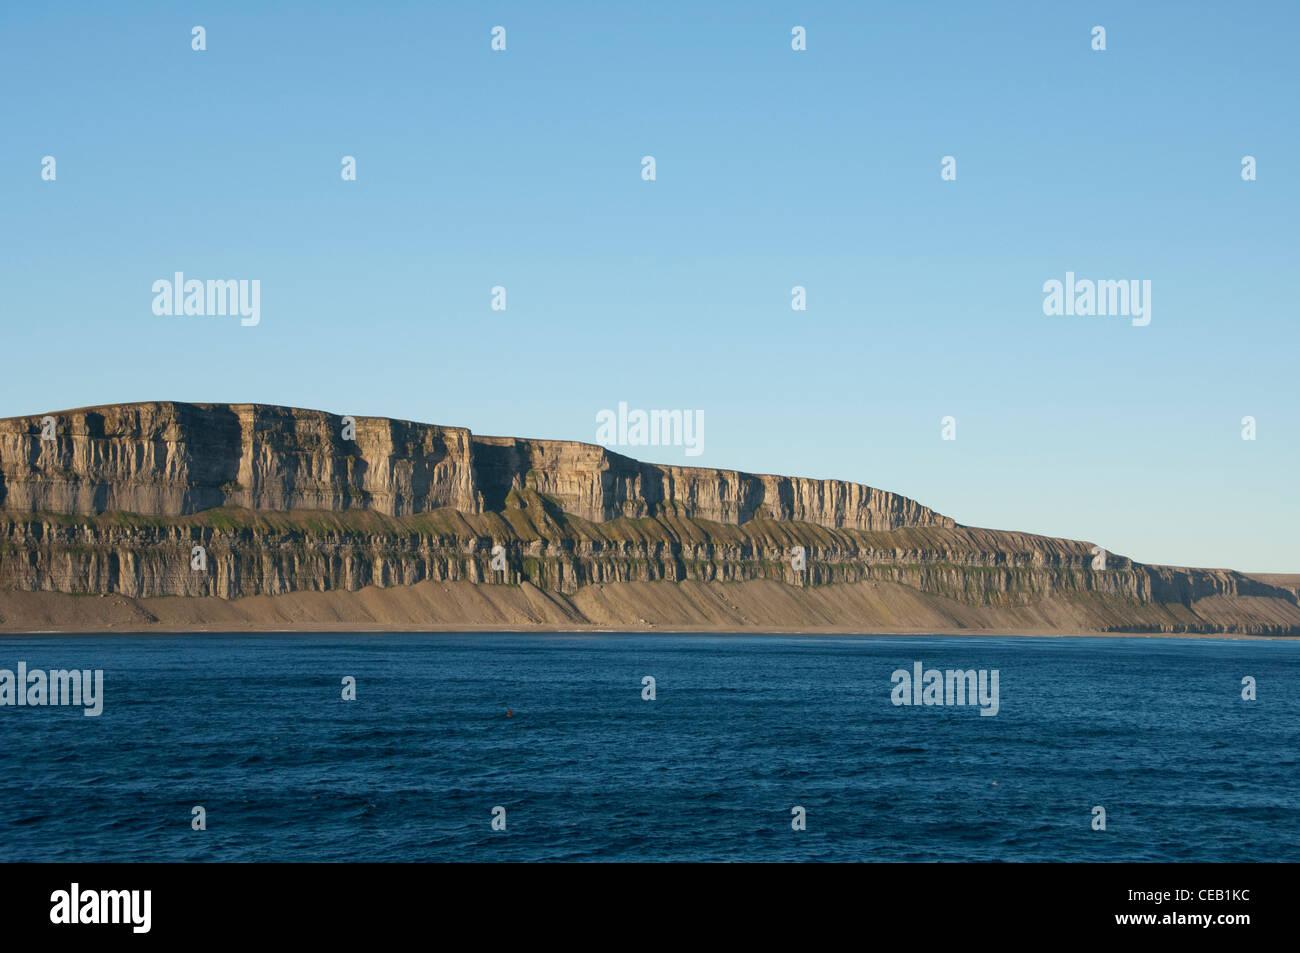 Canada, Nunavut, Qikiqtaaluk Region, remote Akpatok Island. - Stock Image